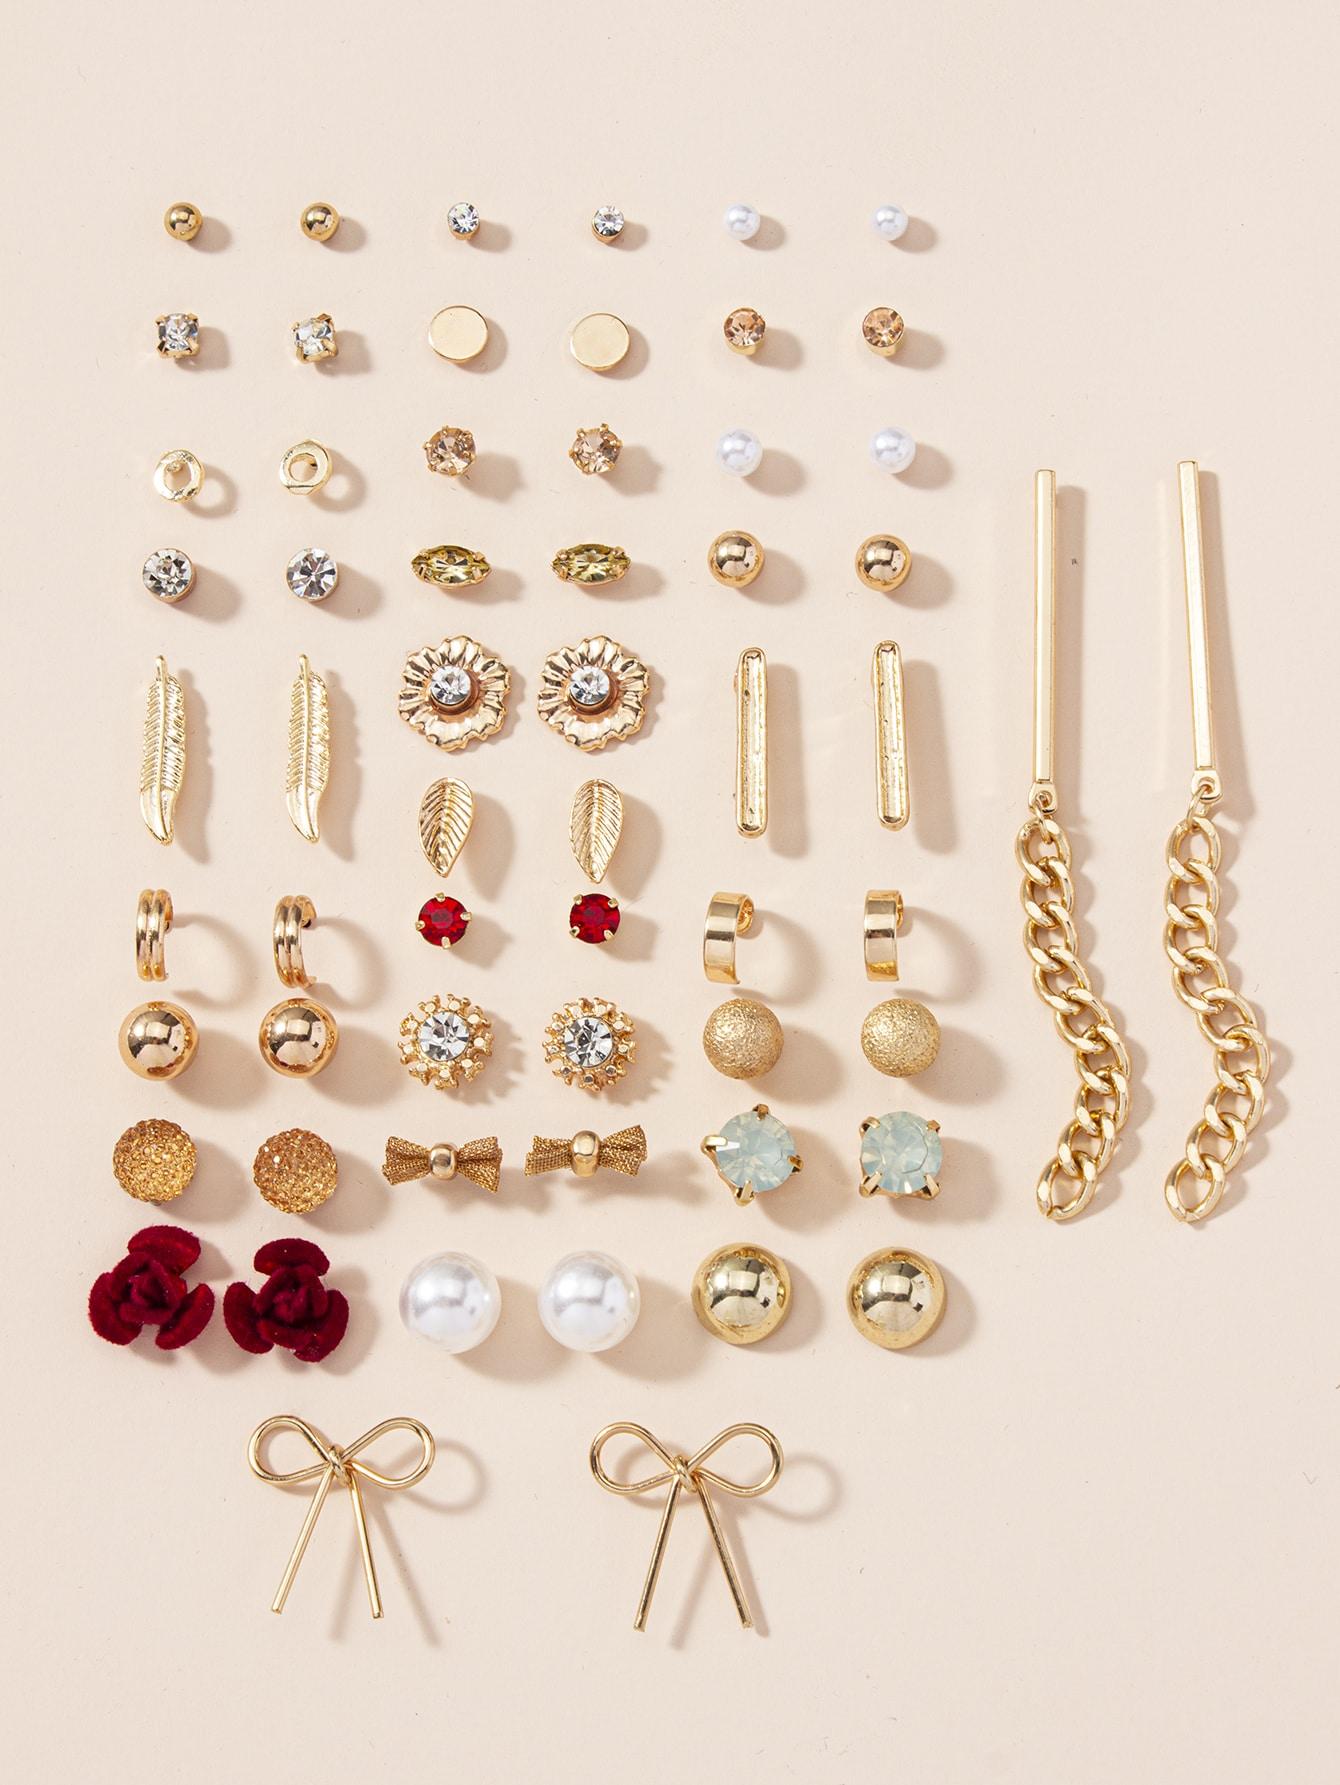 30pairs Rhinestone & Faux Pearl Decor Earrings thumbnail